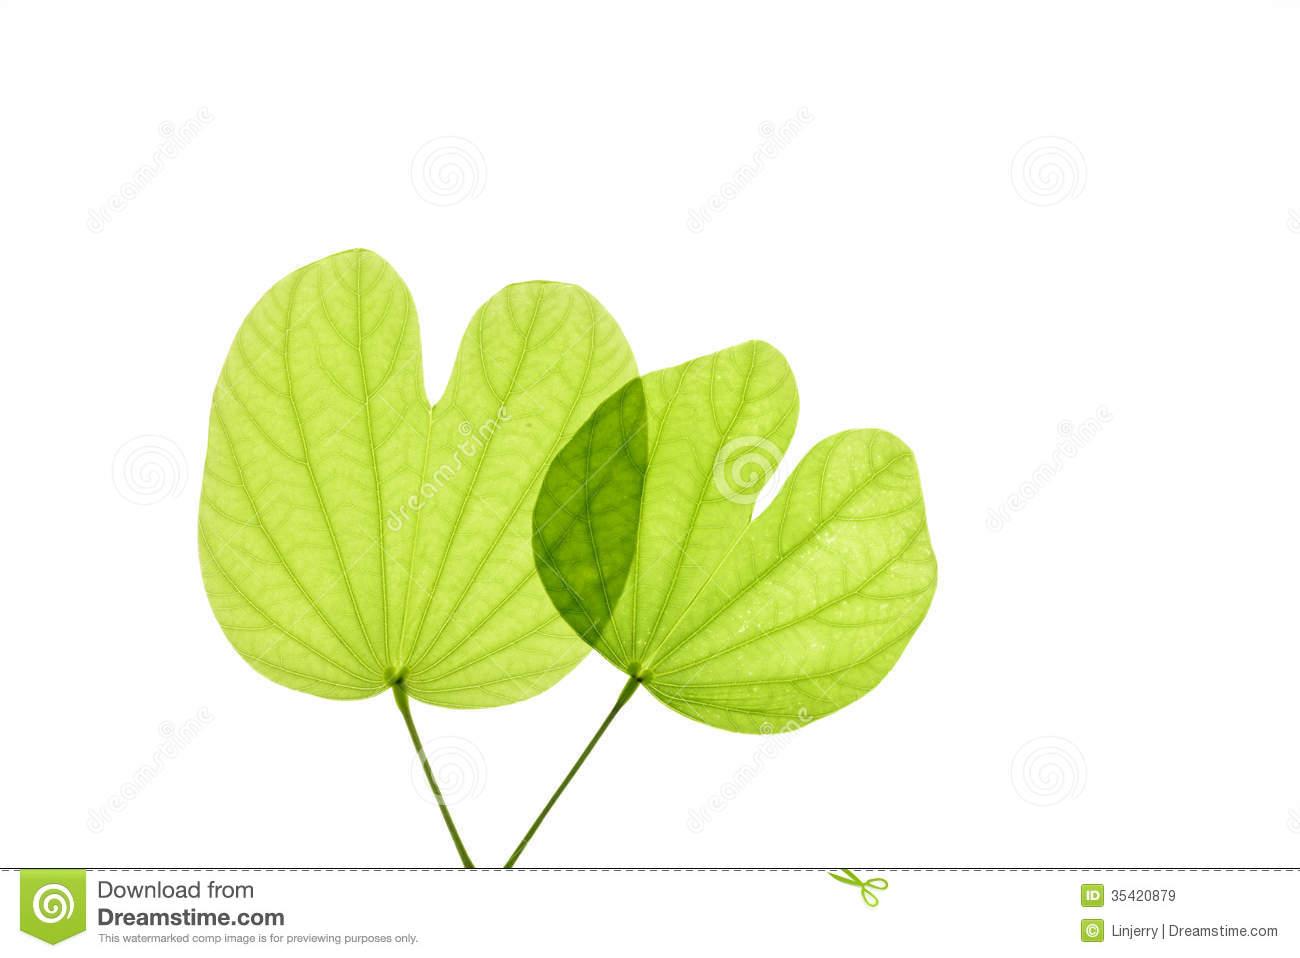 Bauhinia Leaf Stock Photos, Images, & Pictures.